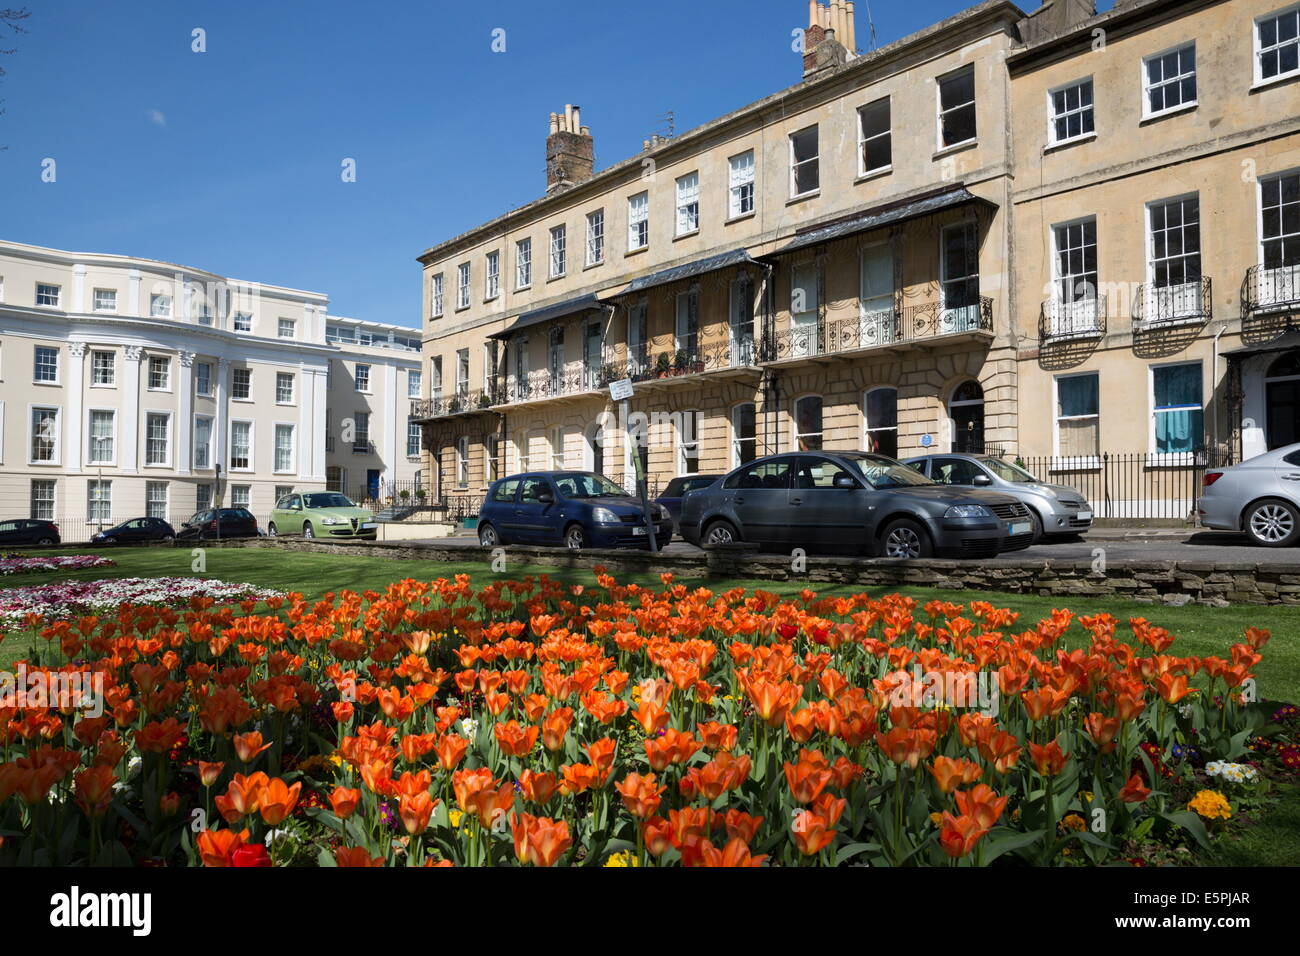 Priorato Parade, casas de estilo Regencia con muelle de tulipanes, Cheltenham, Gloucestershire, Inglaterra, Reino Imagen De Stock